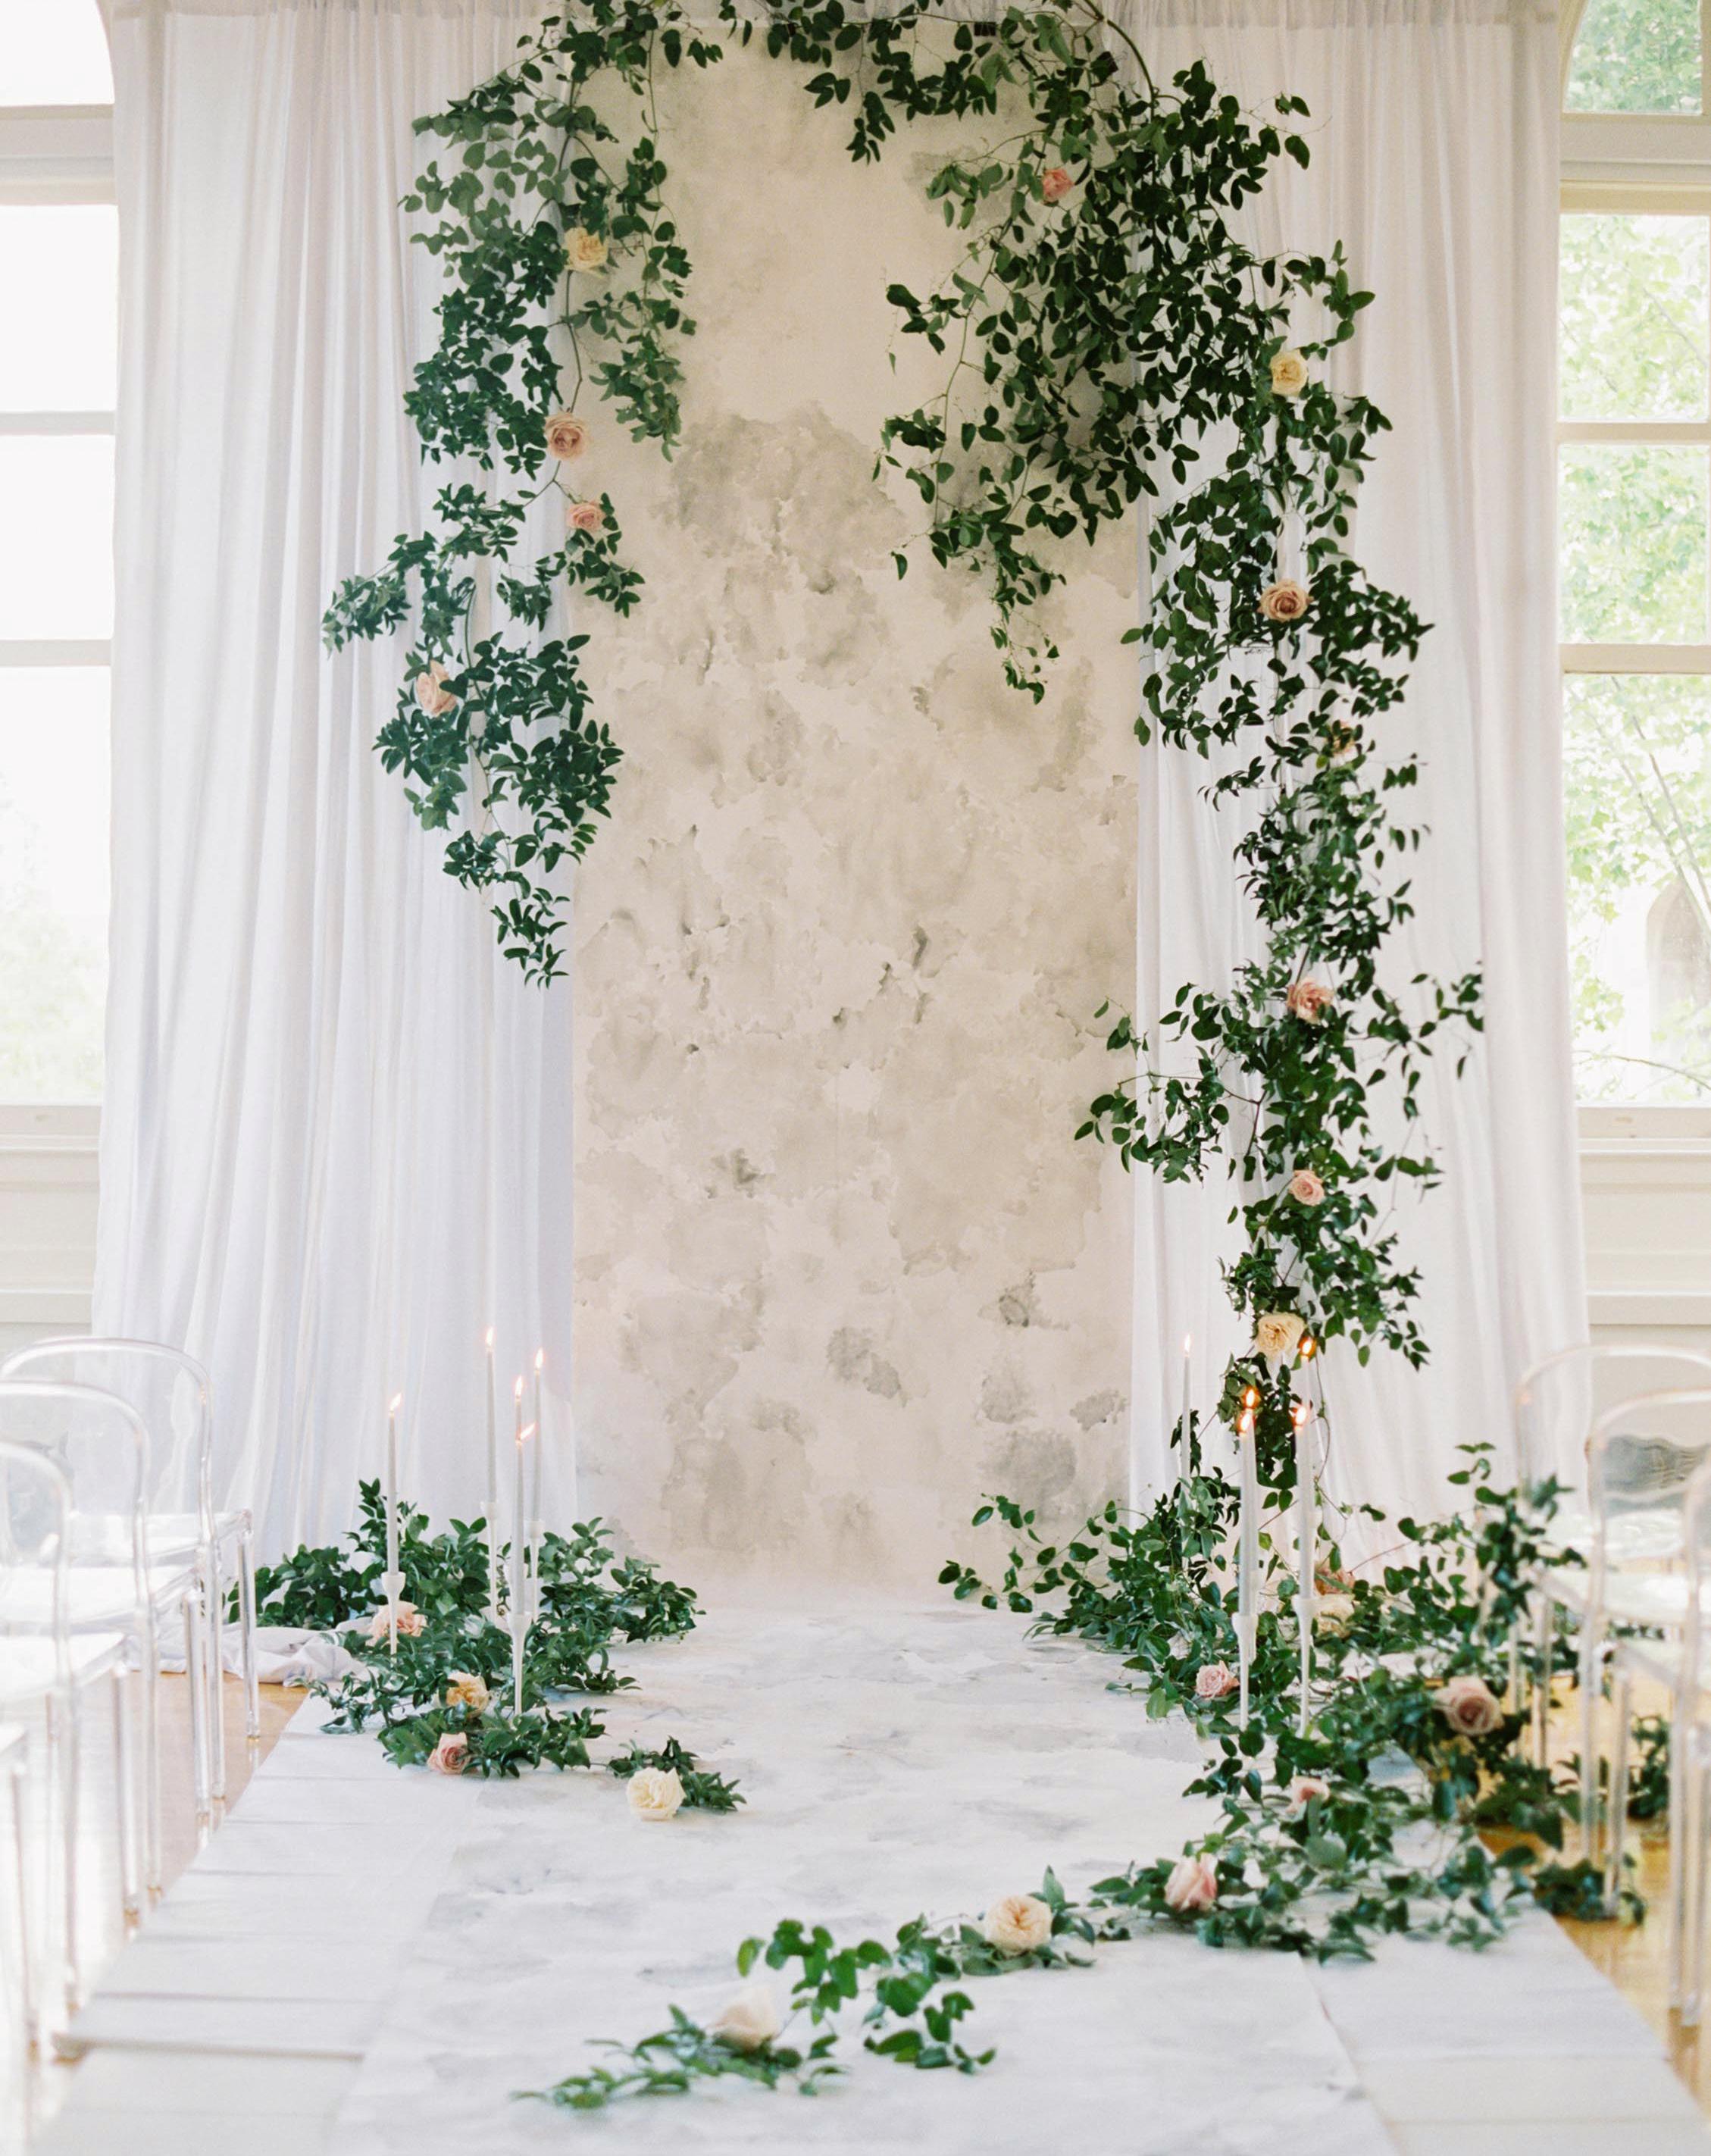 airy wedding backdrop drapery painted runner greenery